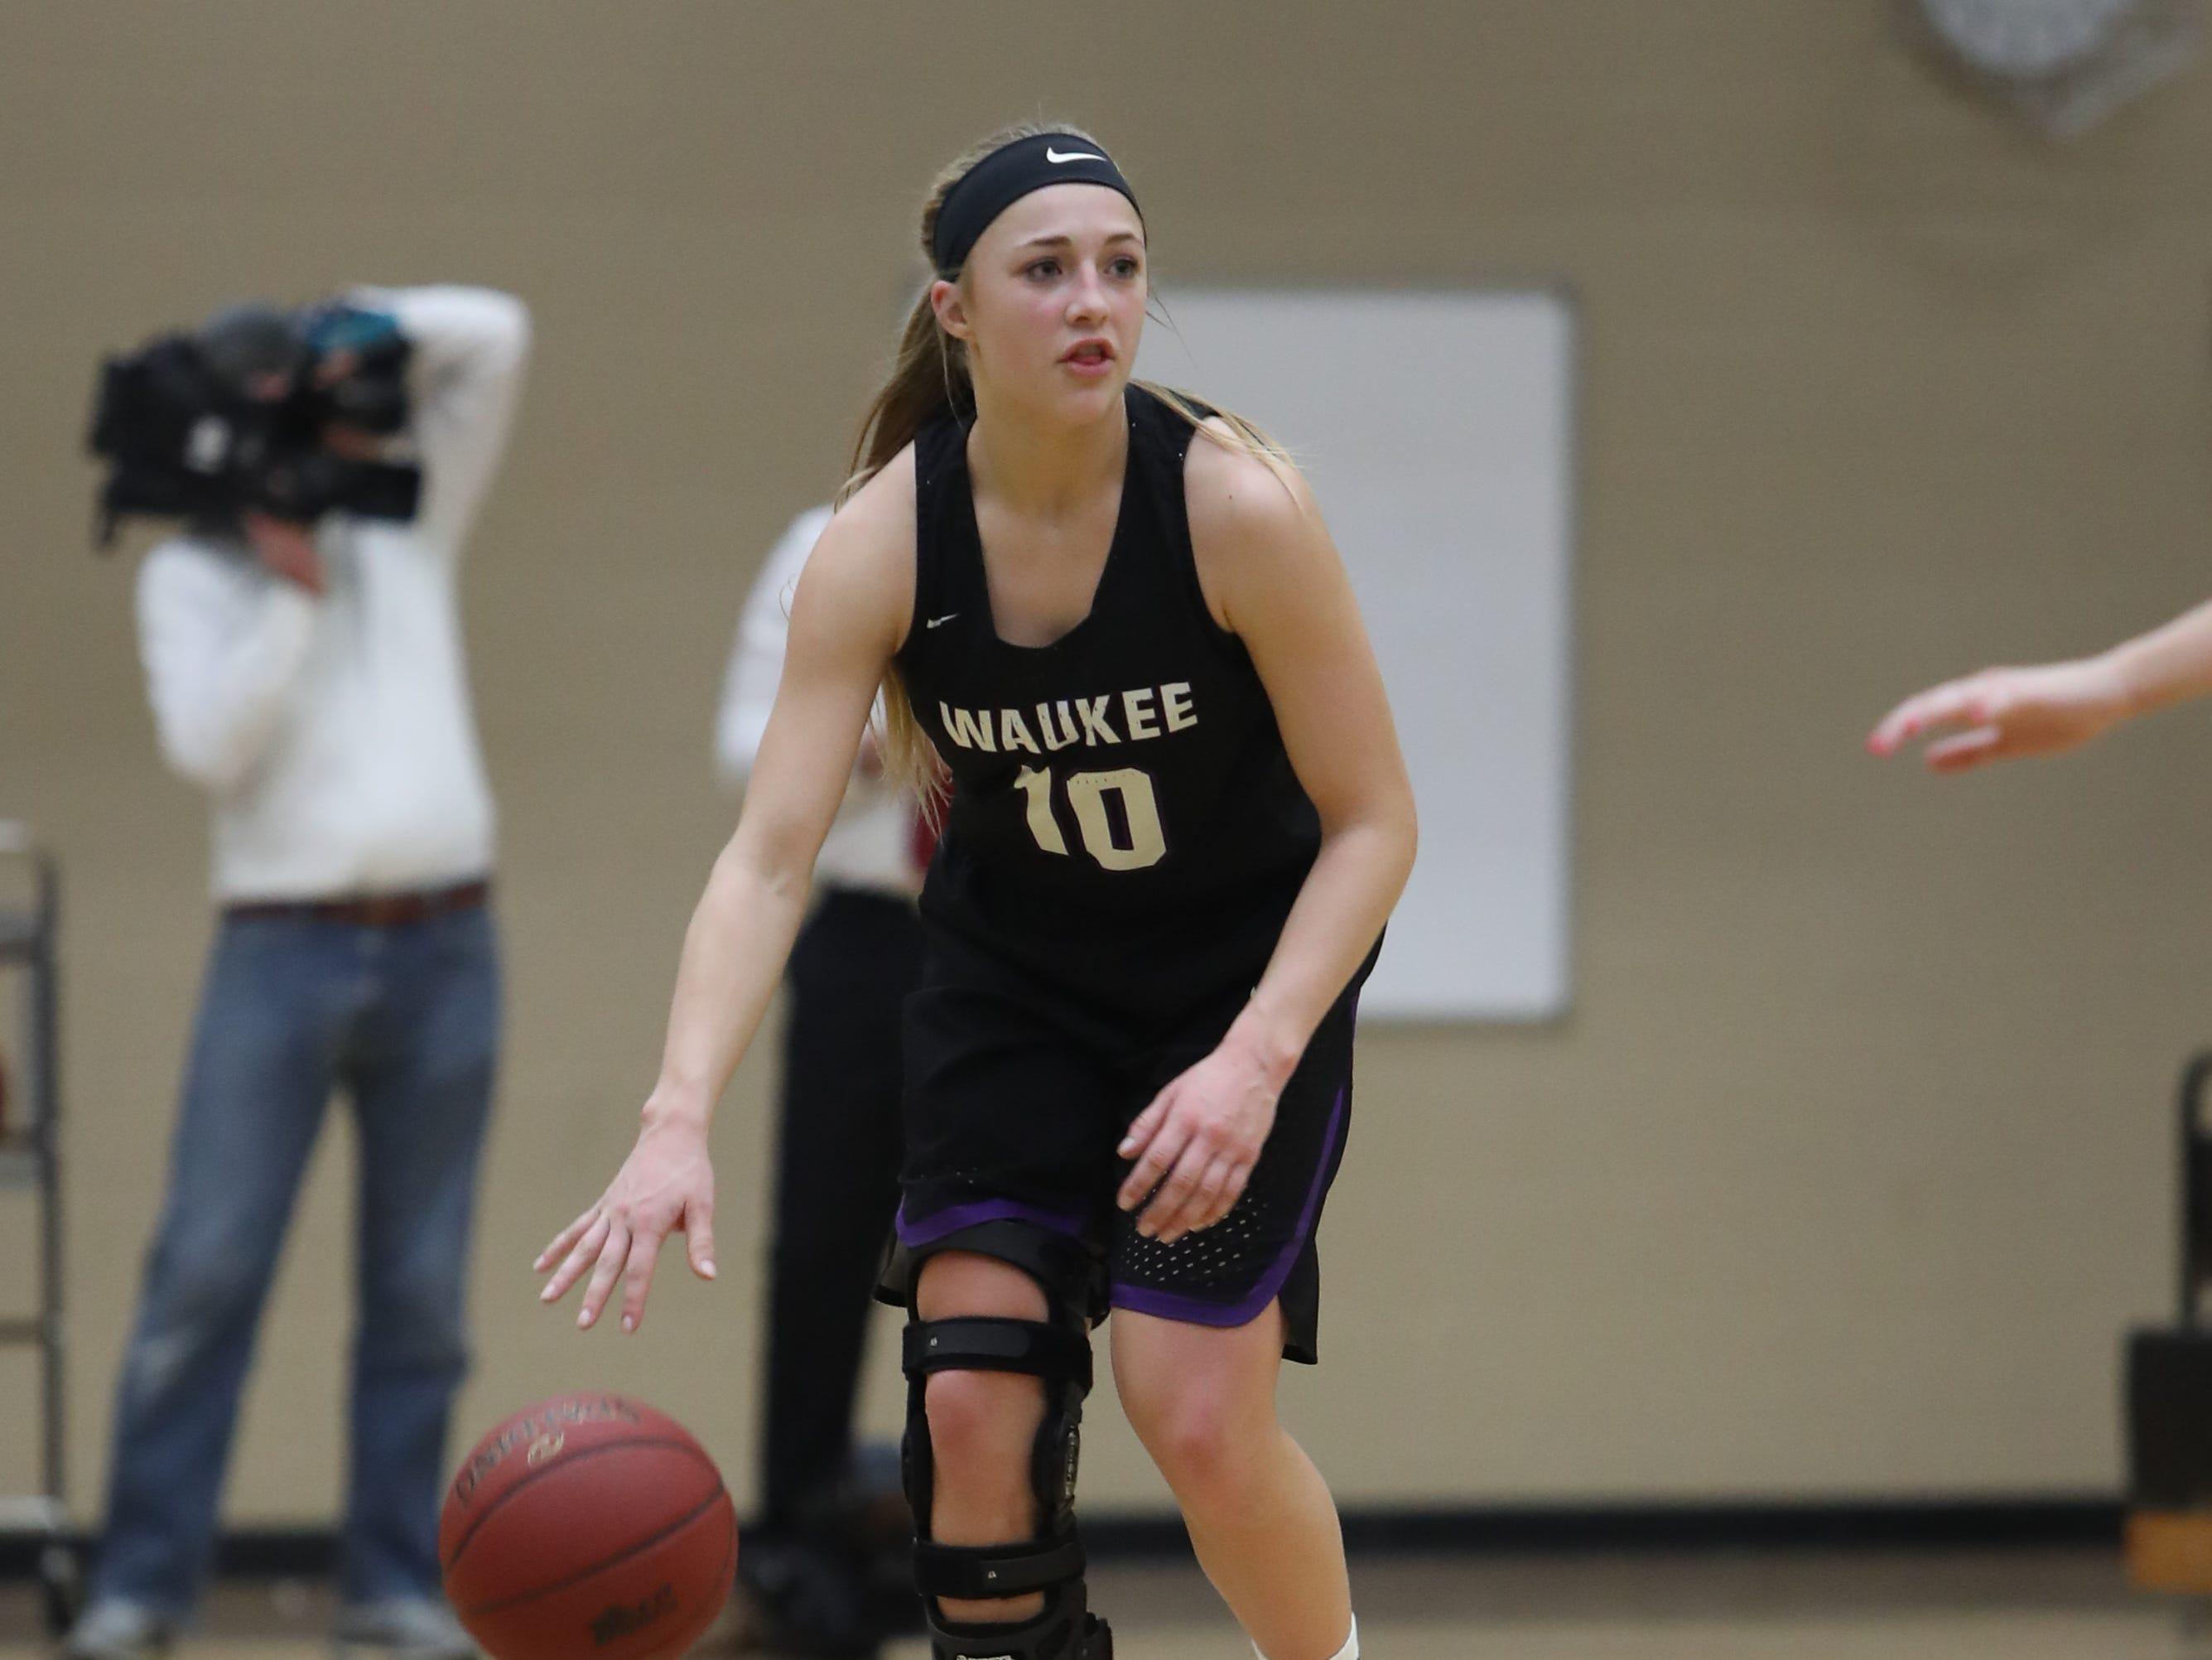 Waukee Warriors' Katie Dinnebier (10) sets the offense against the Southeast Polk Rams during a game Feb. 1, 2019 at Southeast Polk High School.